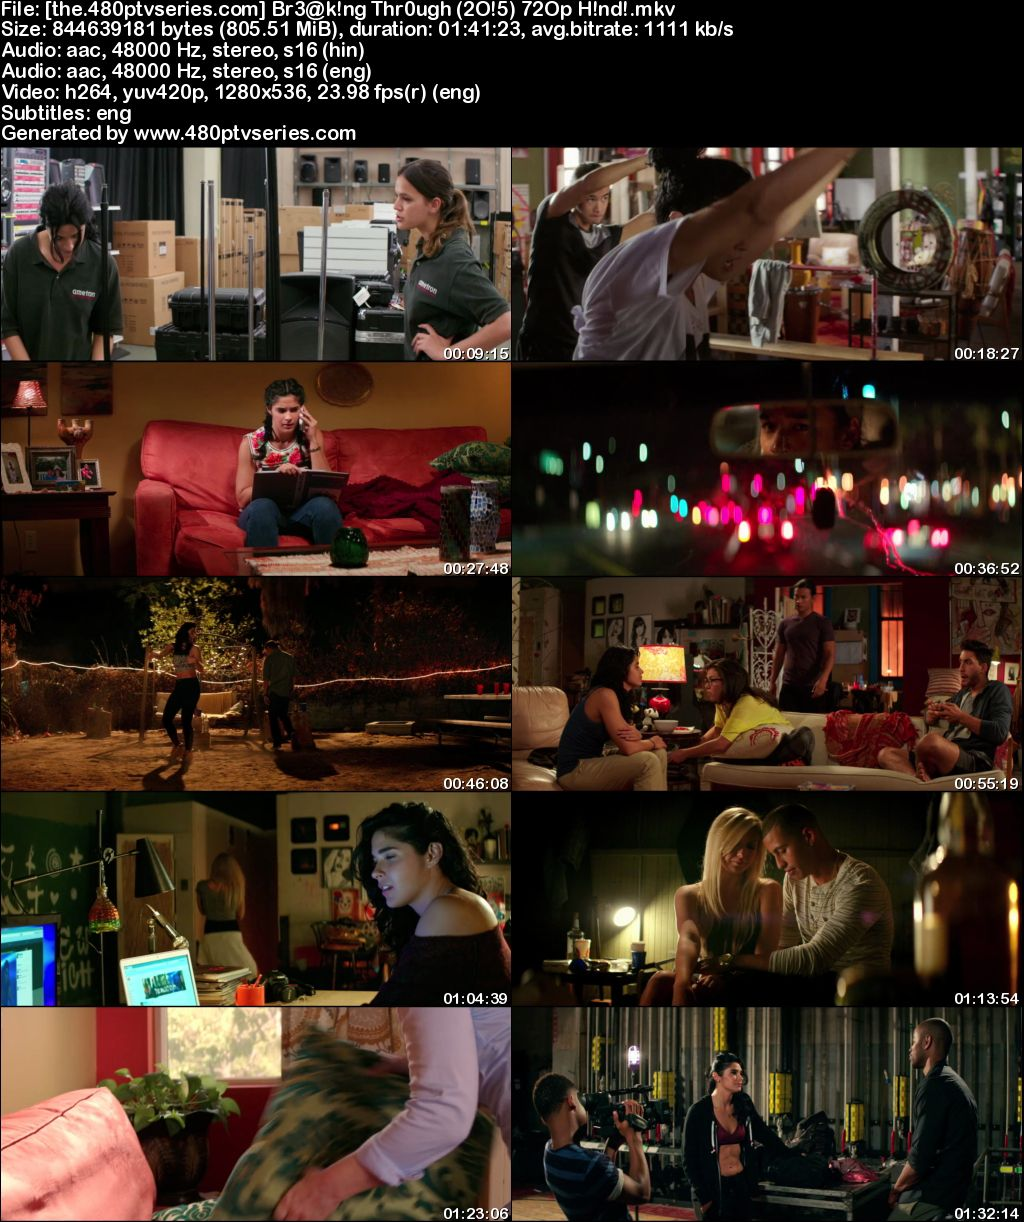 Watch Online Free Breaking Through (2015) Full Hindi Dual Audio Movie Download 480p 720p Bluray